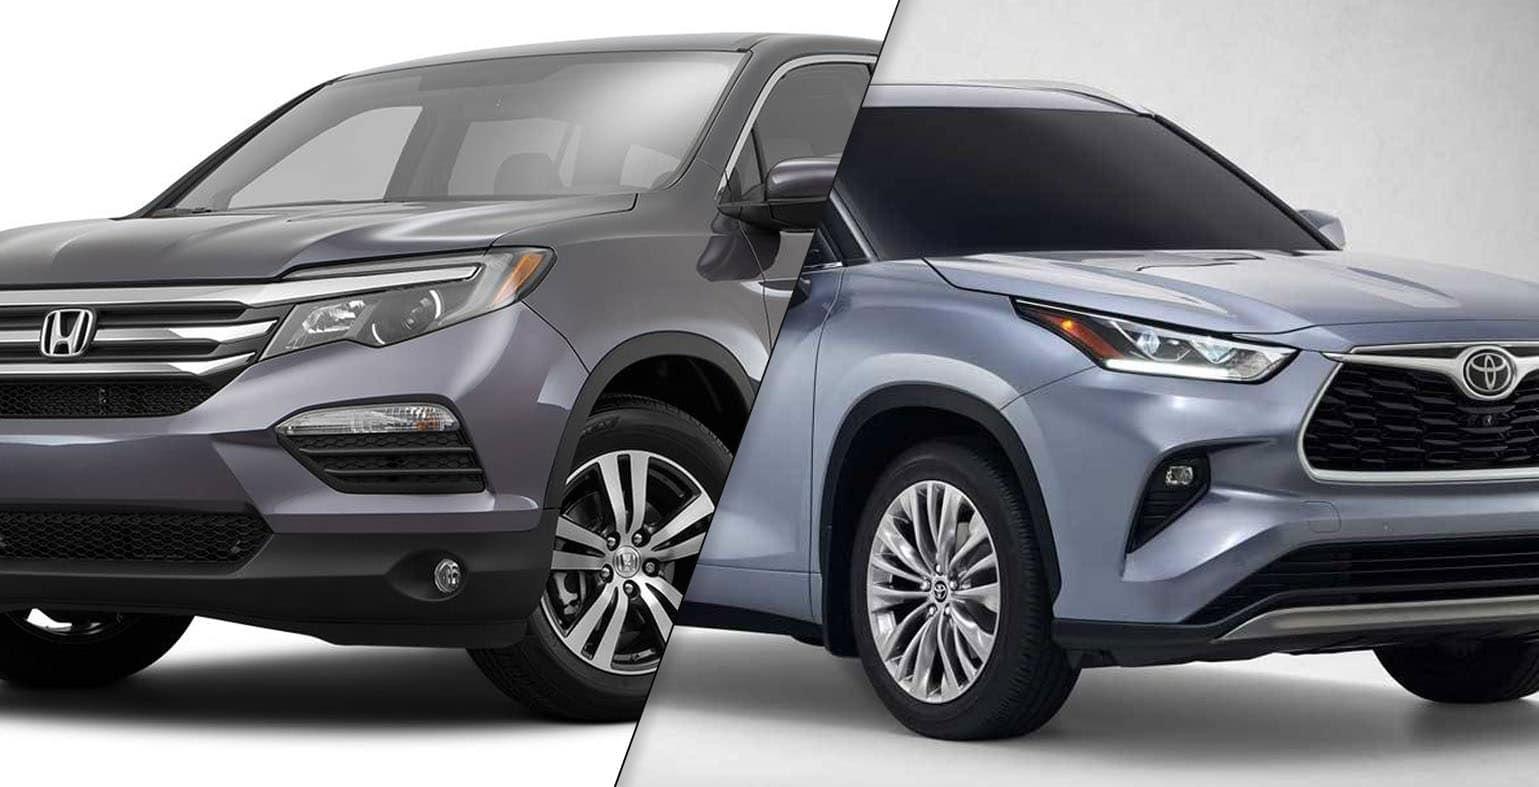 2020 Toyota Highlander vs 2019 Honda Pilot